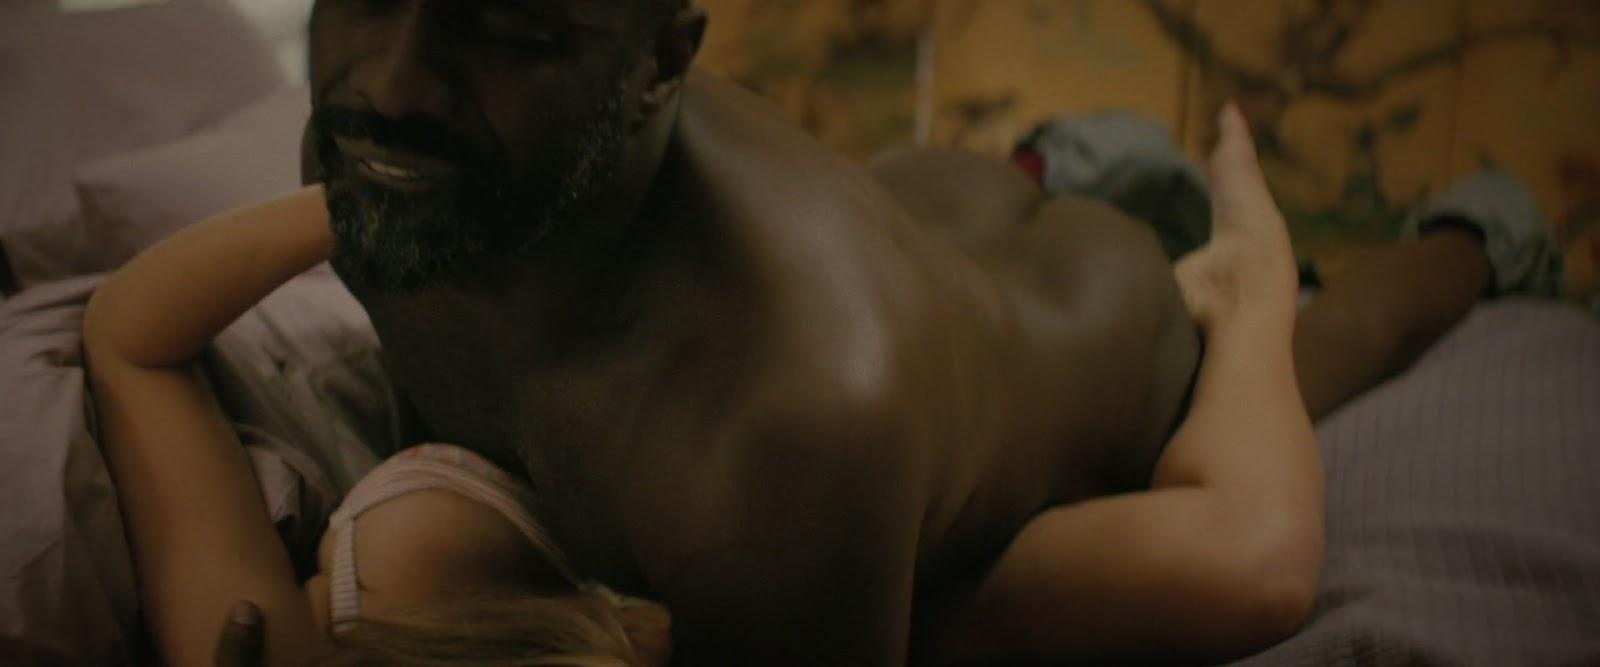 Adele exarchopoulos nude sex scene in le fidele scandalplanetcom 5